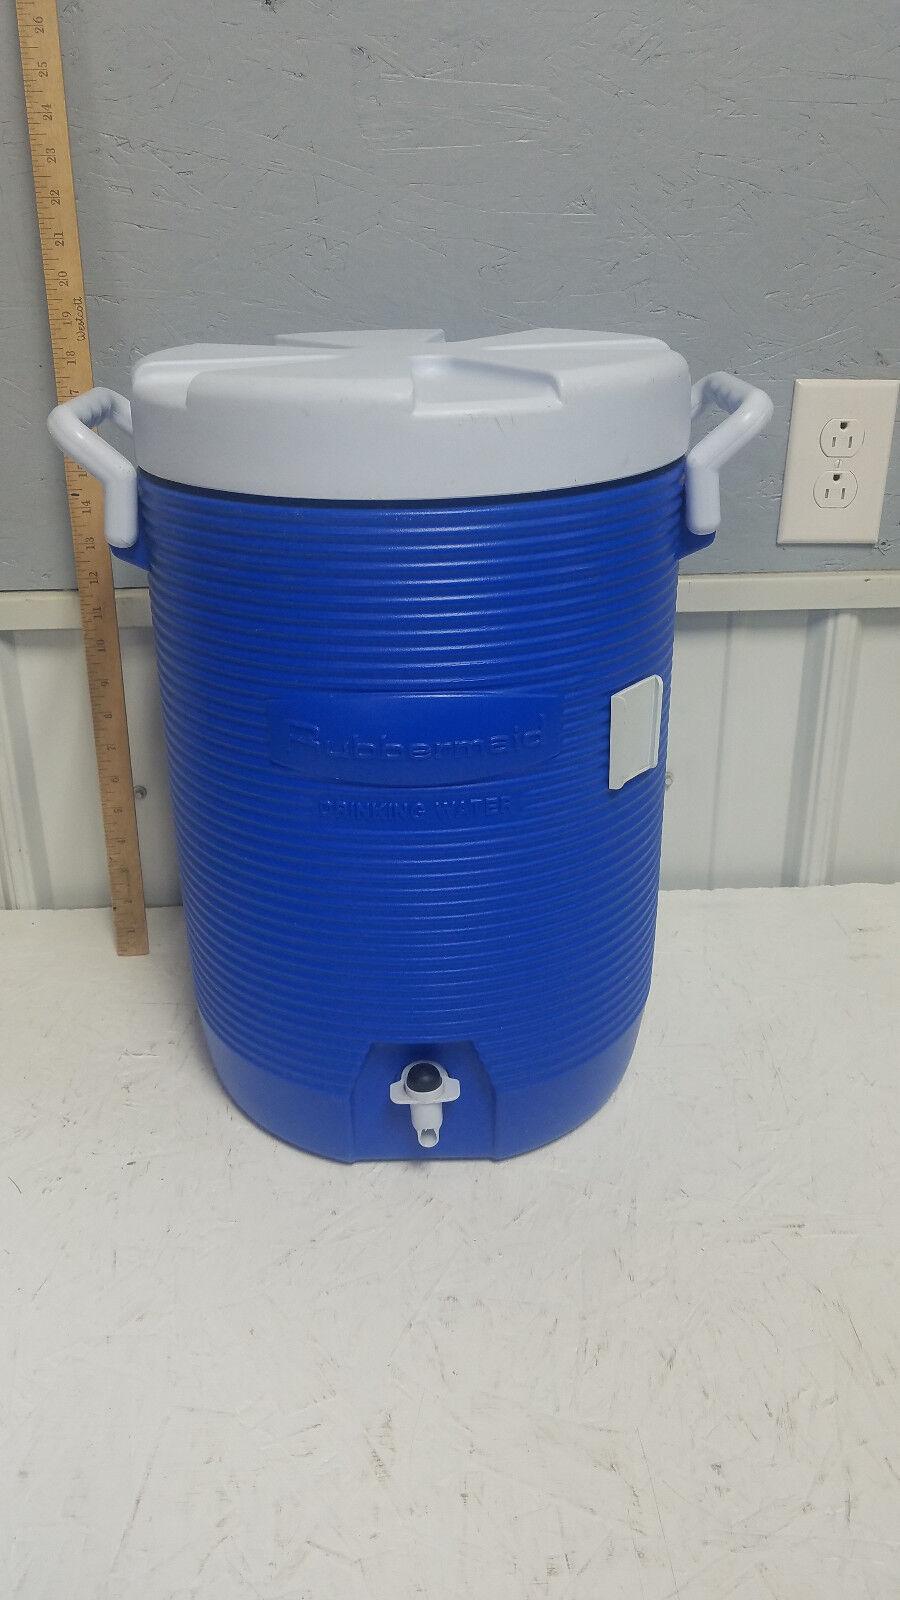 Rubbermaid Gott bluee   White 5 Gallon Water Cooler Model 1685